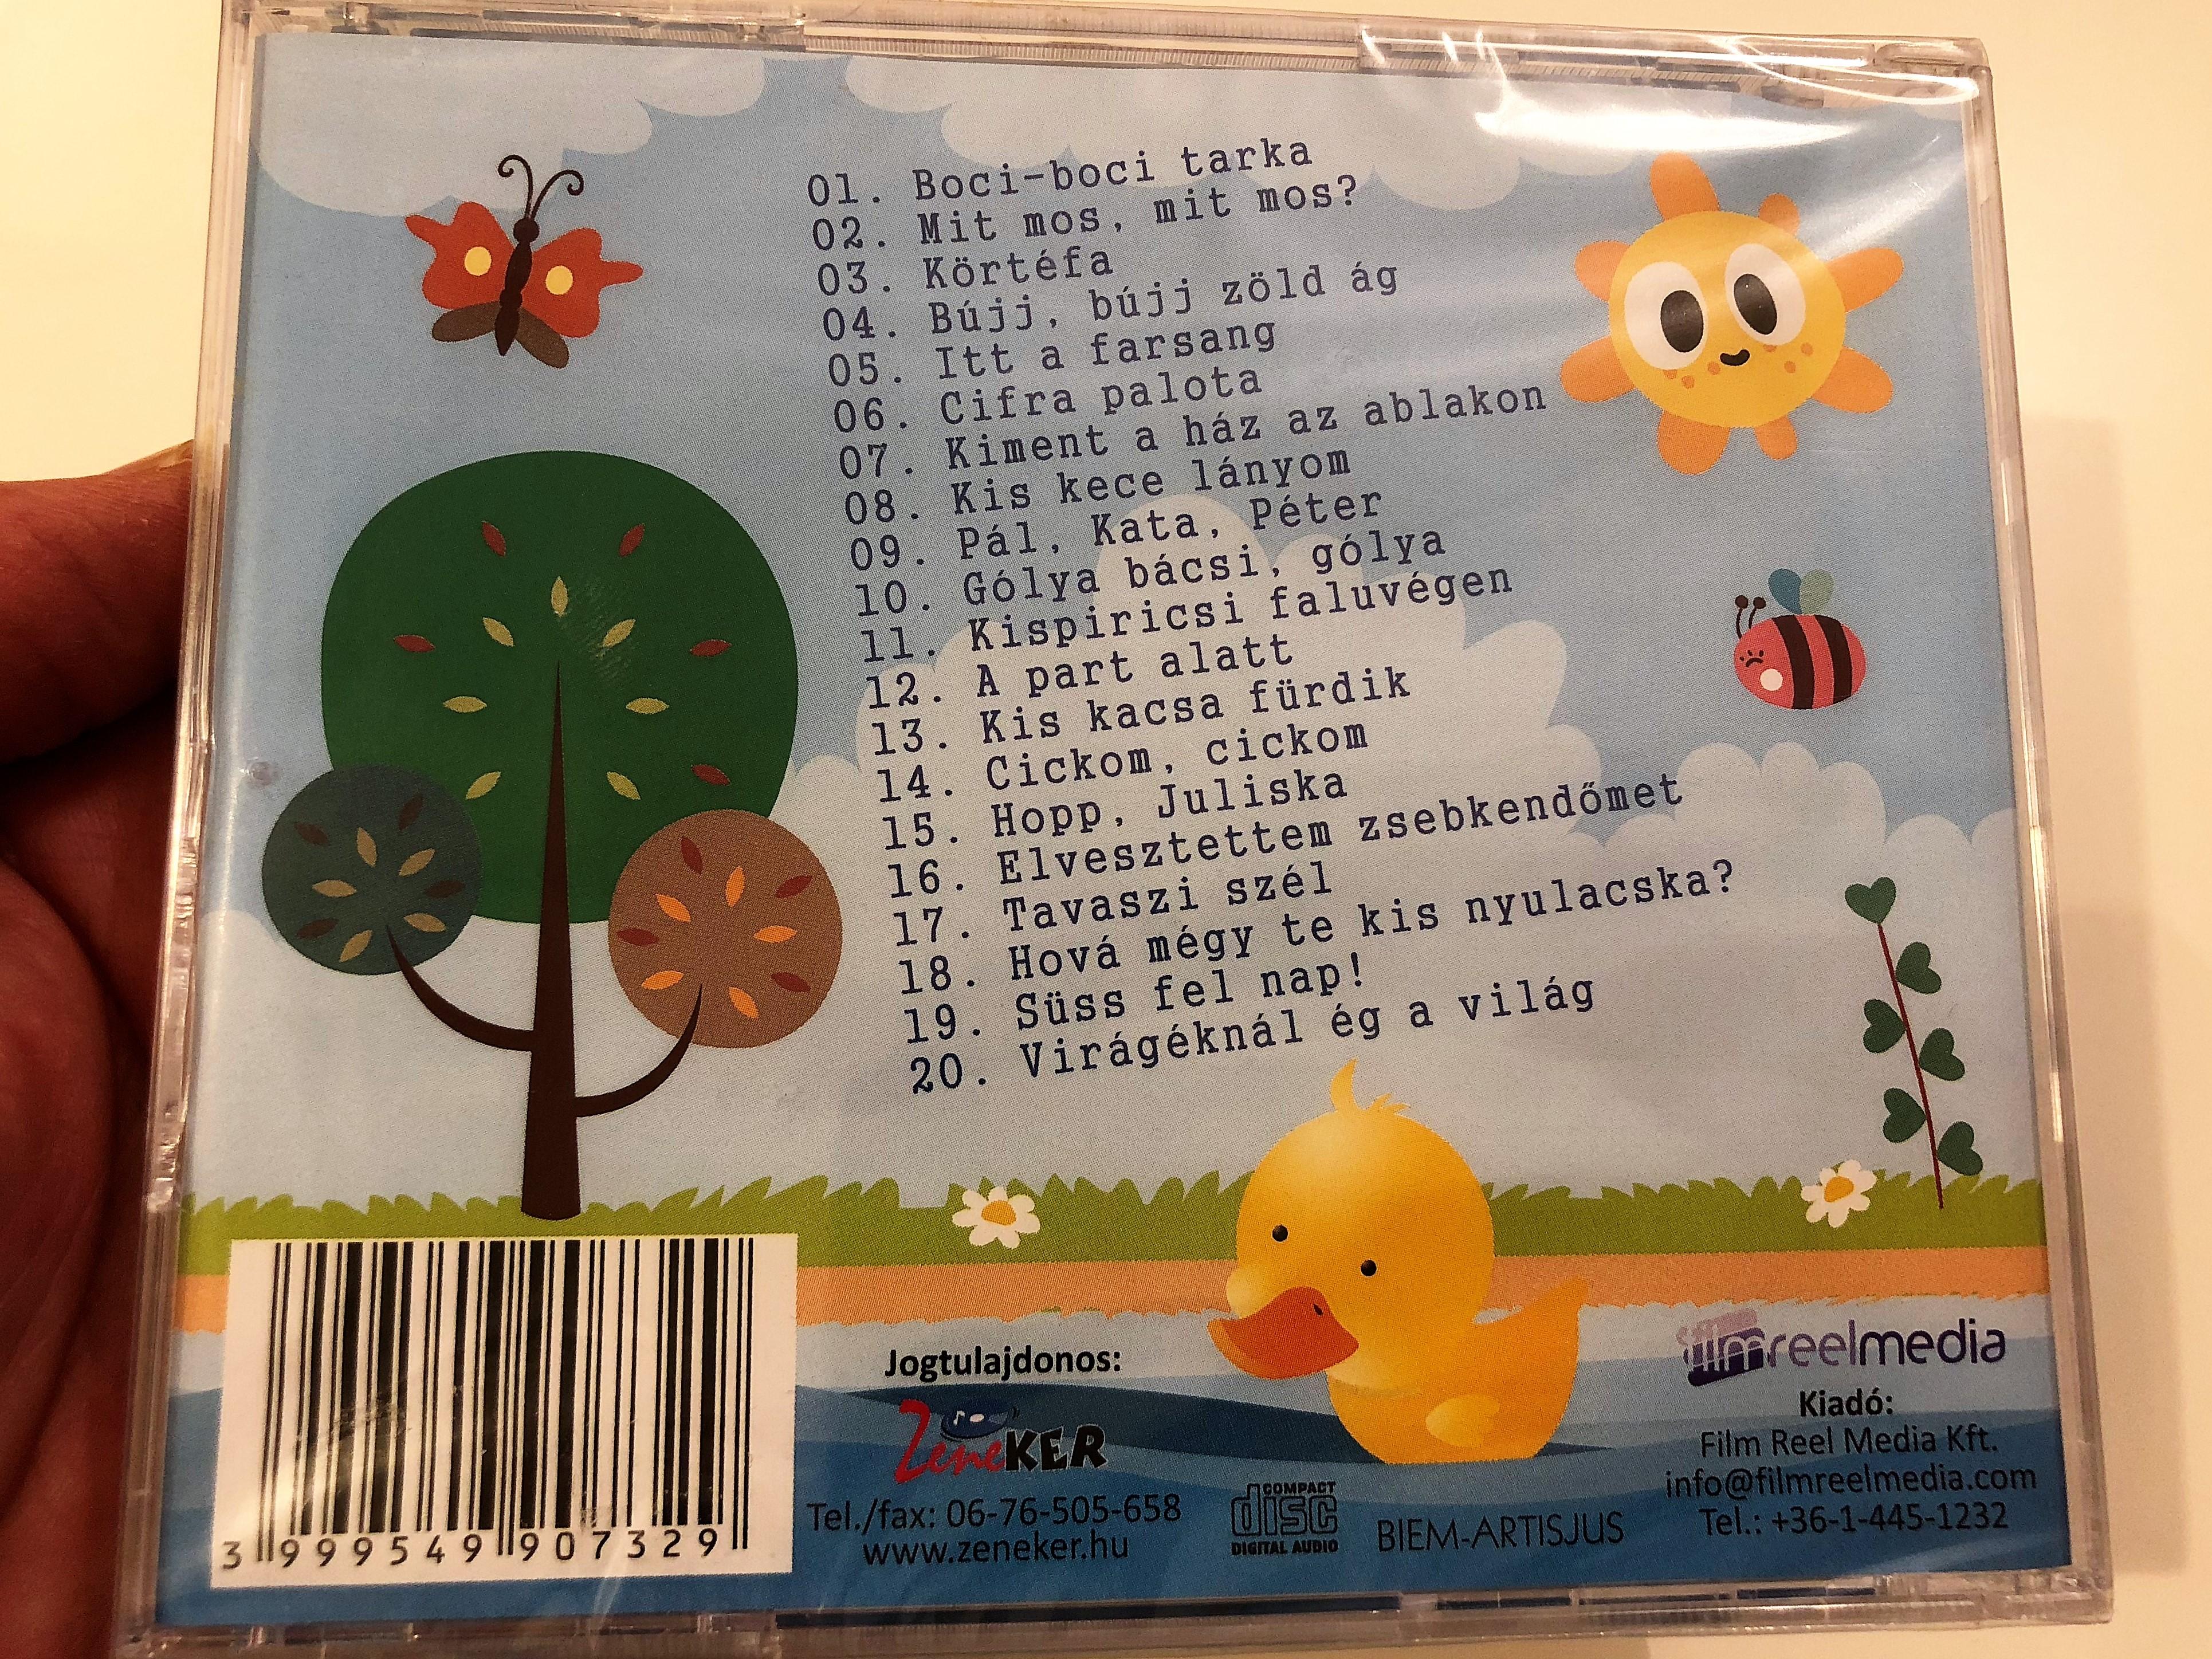 kis-kacsa-f-rdik-audio-cd-popular-hungarian-children-s-songs-for-nursery-and-pre-schoolers-dalok-vod-soknak-s-kisiskol-soknak-2-.jpg